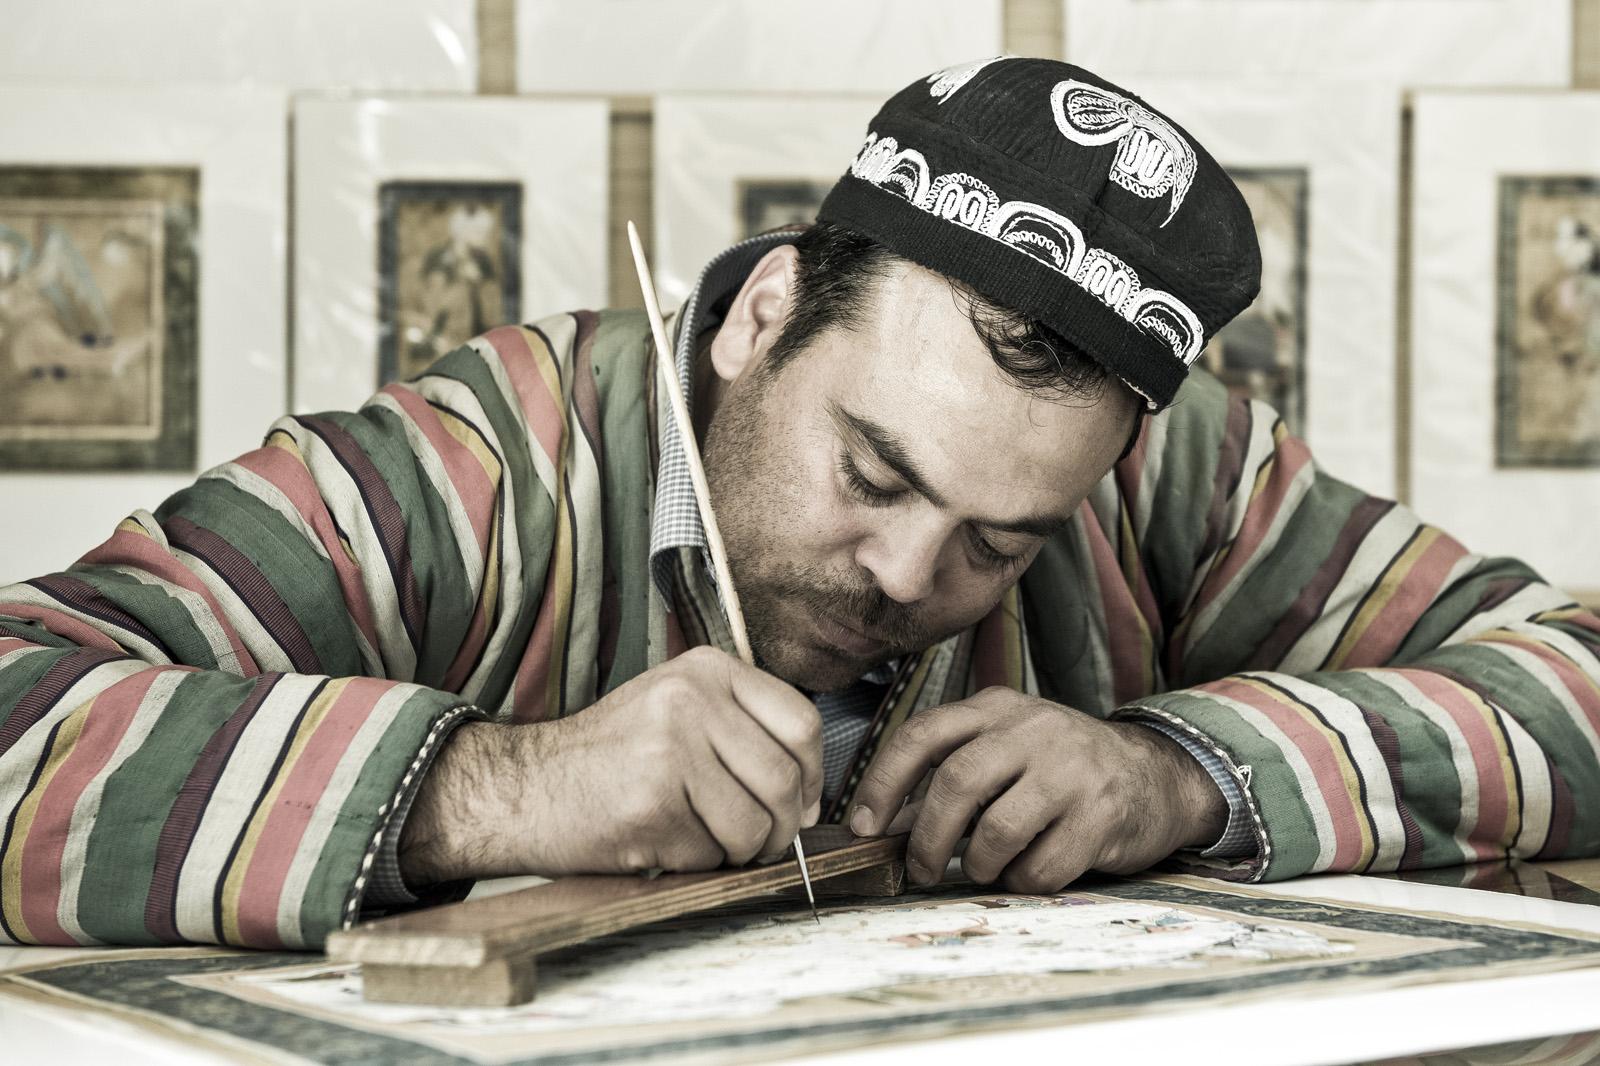 Calígrafo y miniaturista Davlat Toshev. Foto © Ezequiel Scagnetti.